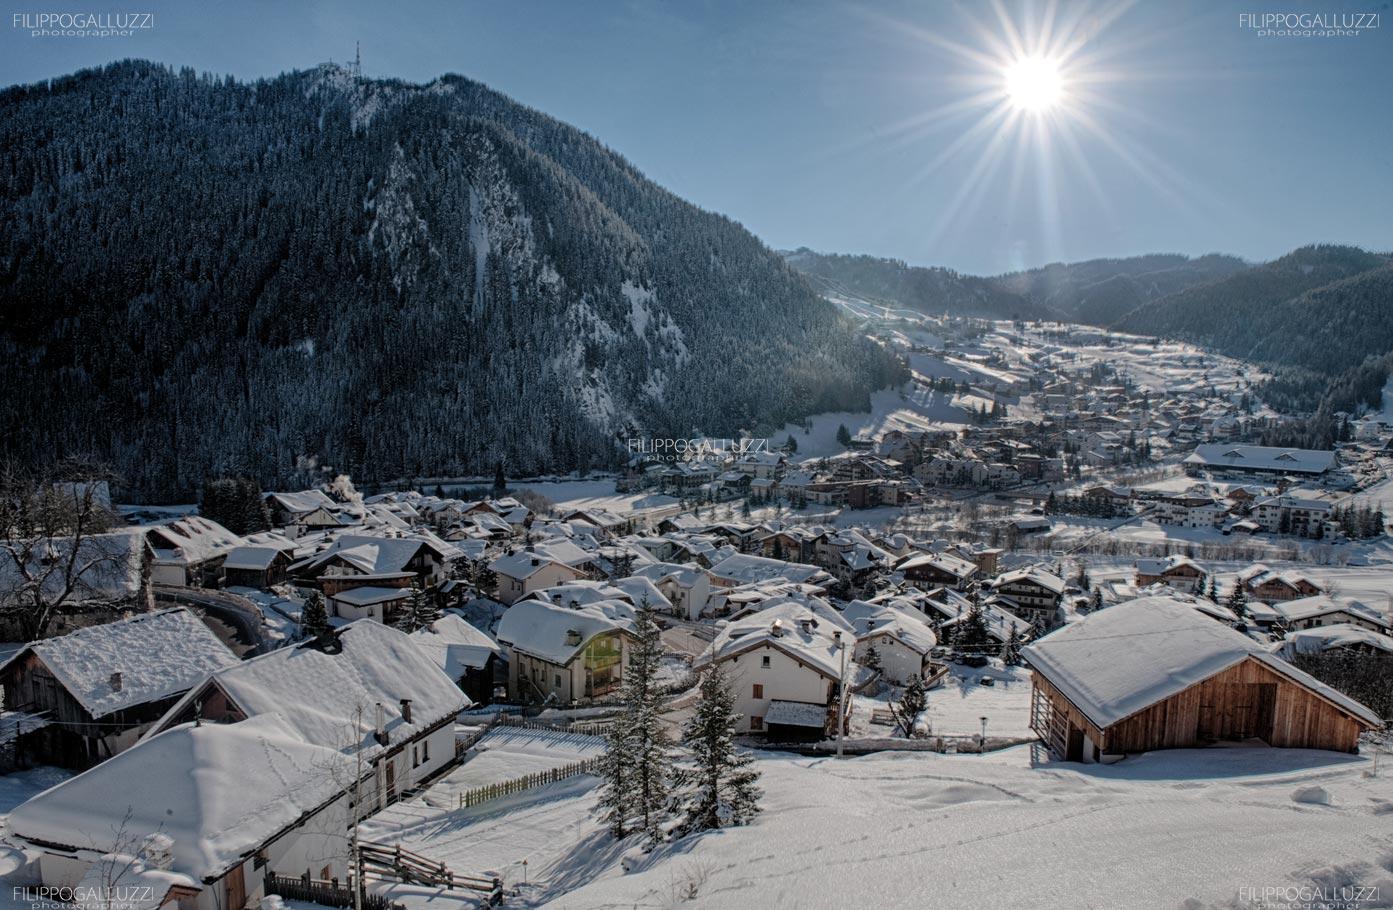 Alto Adige,Inverno su Corvara, Alta Badia,